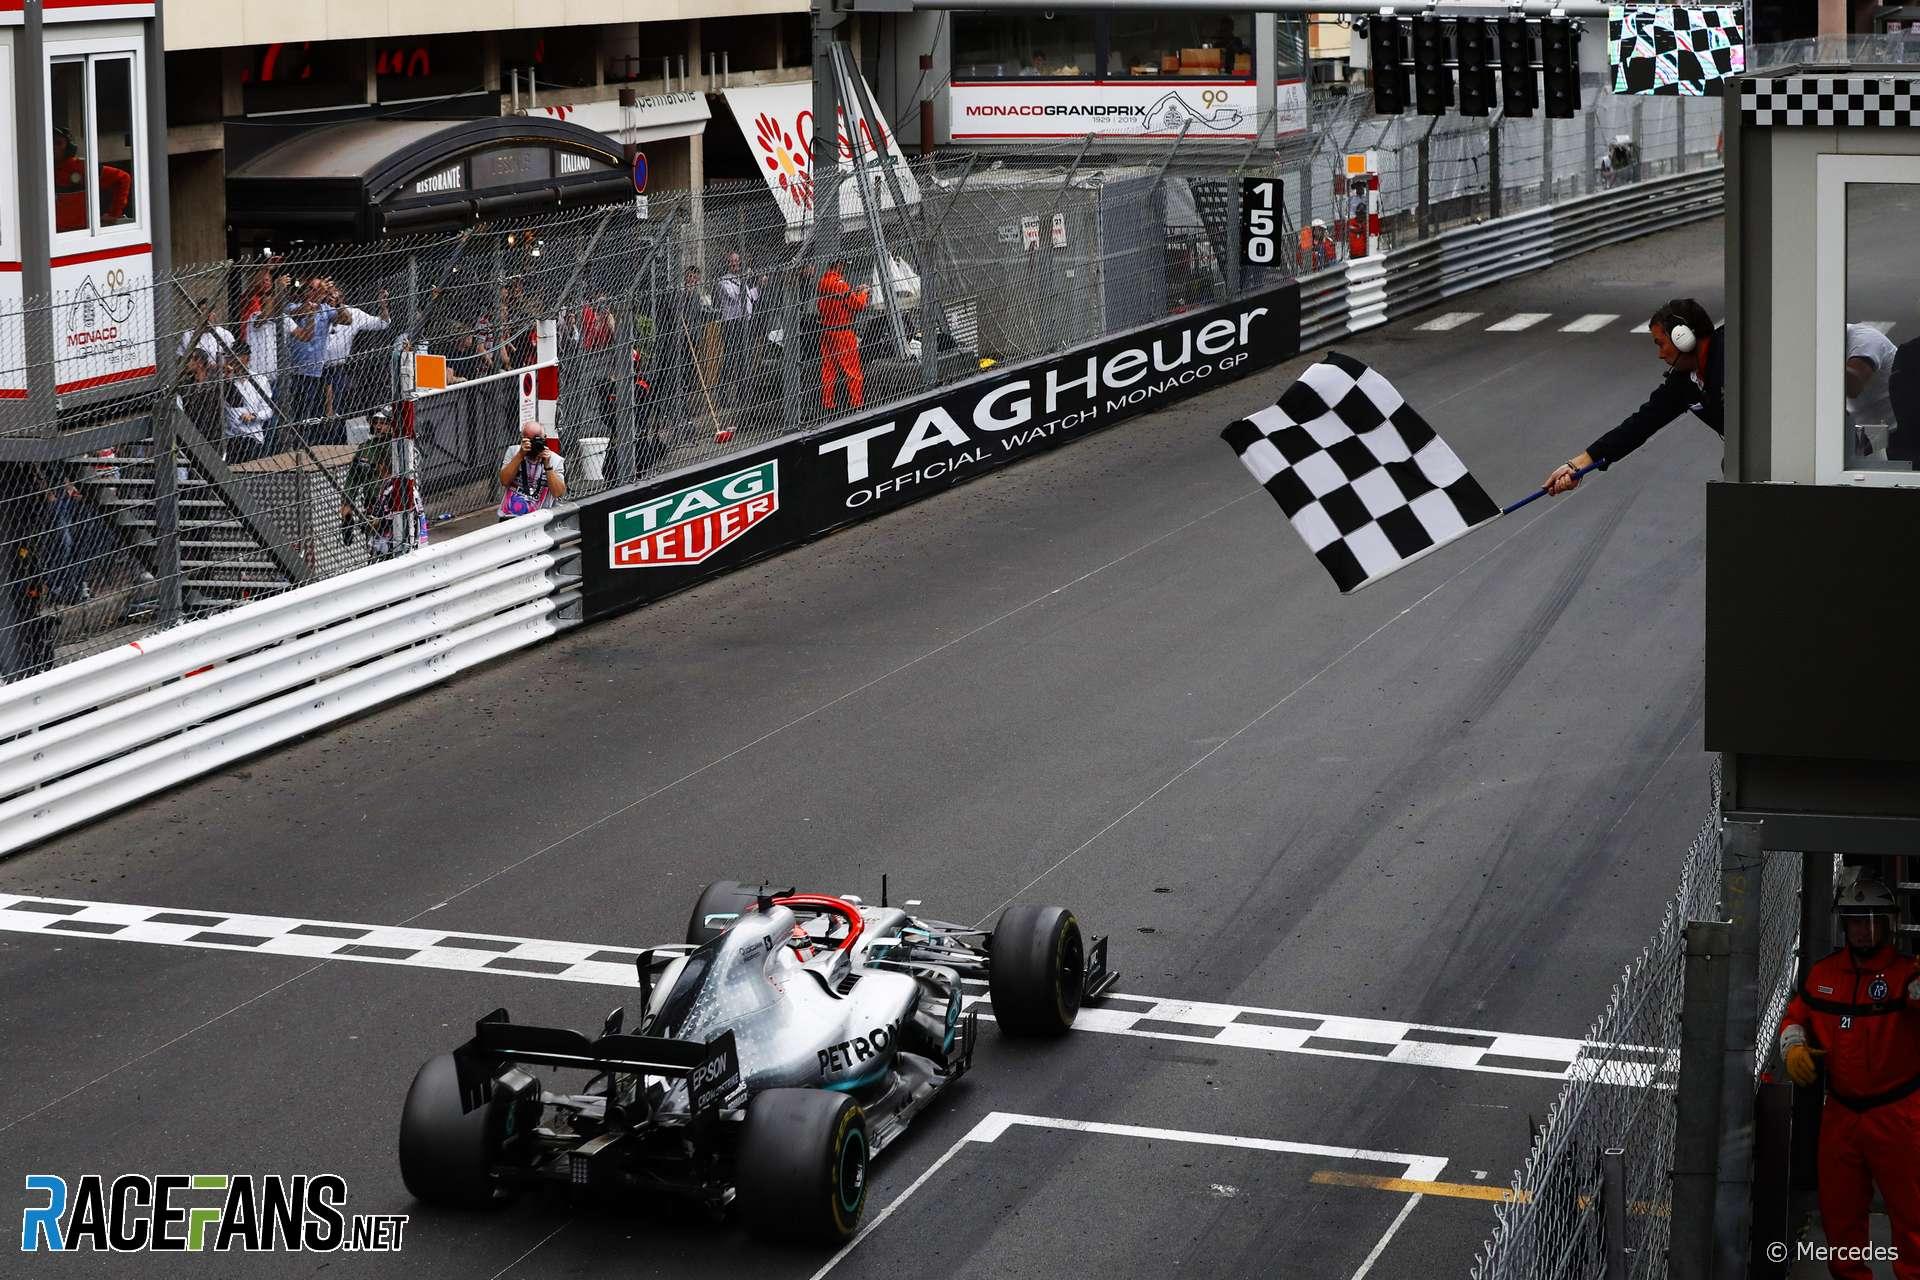 Lewis Hamilton, Mercedes, Monaco, 2019 · RaceFans